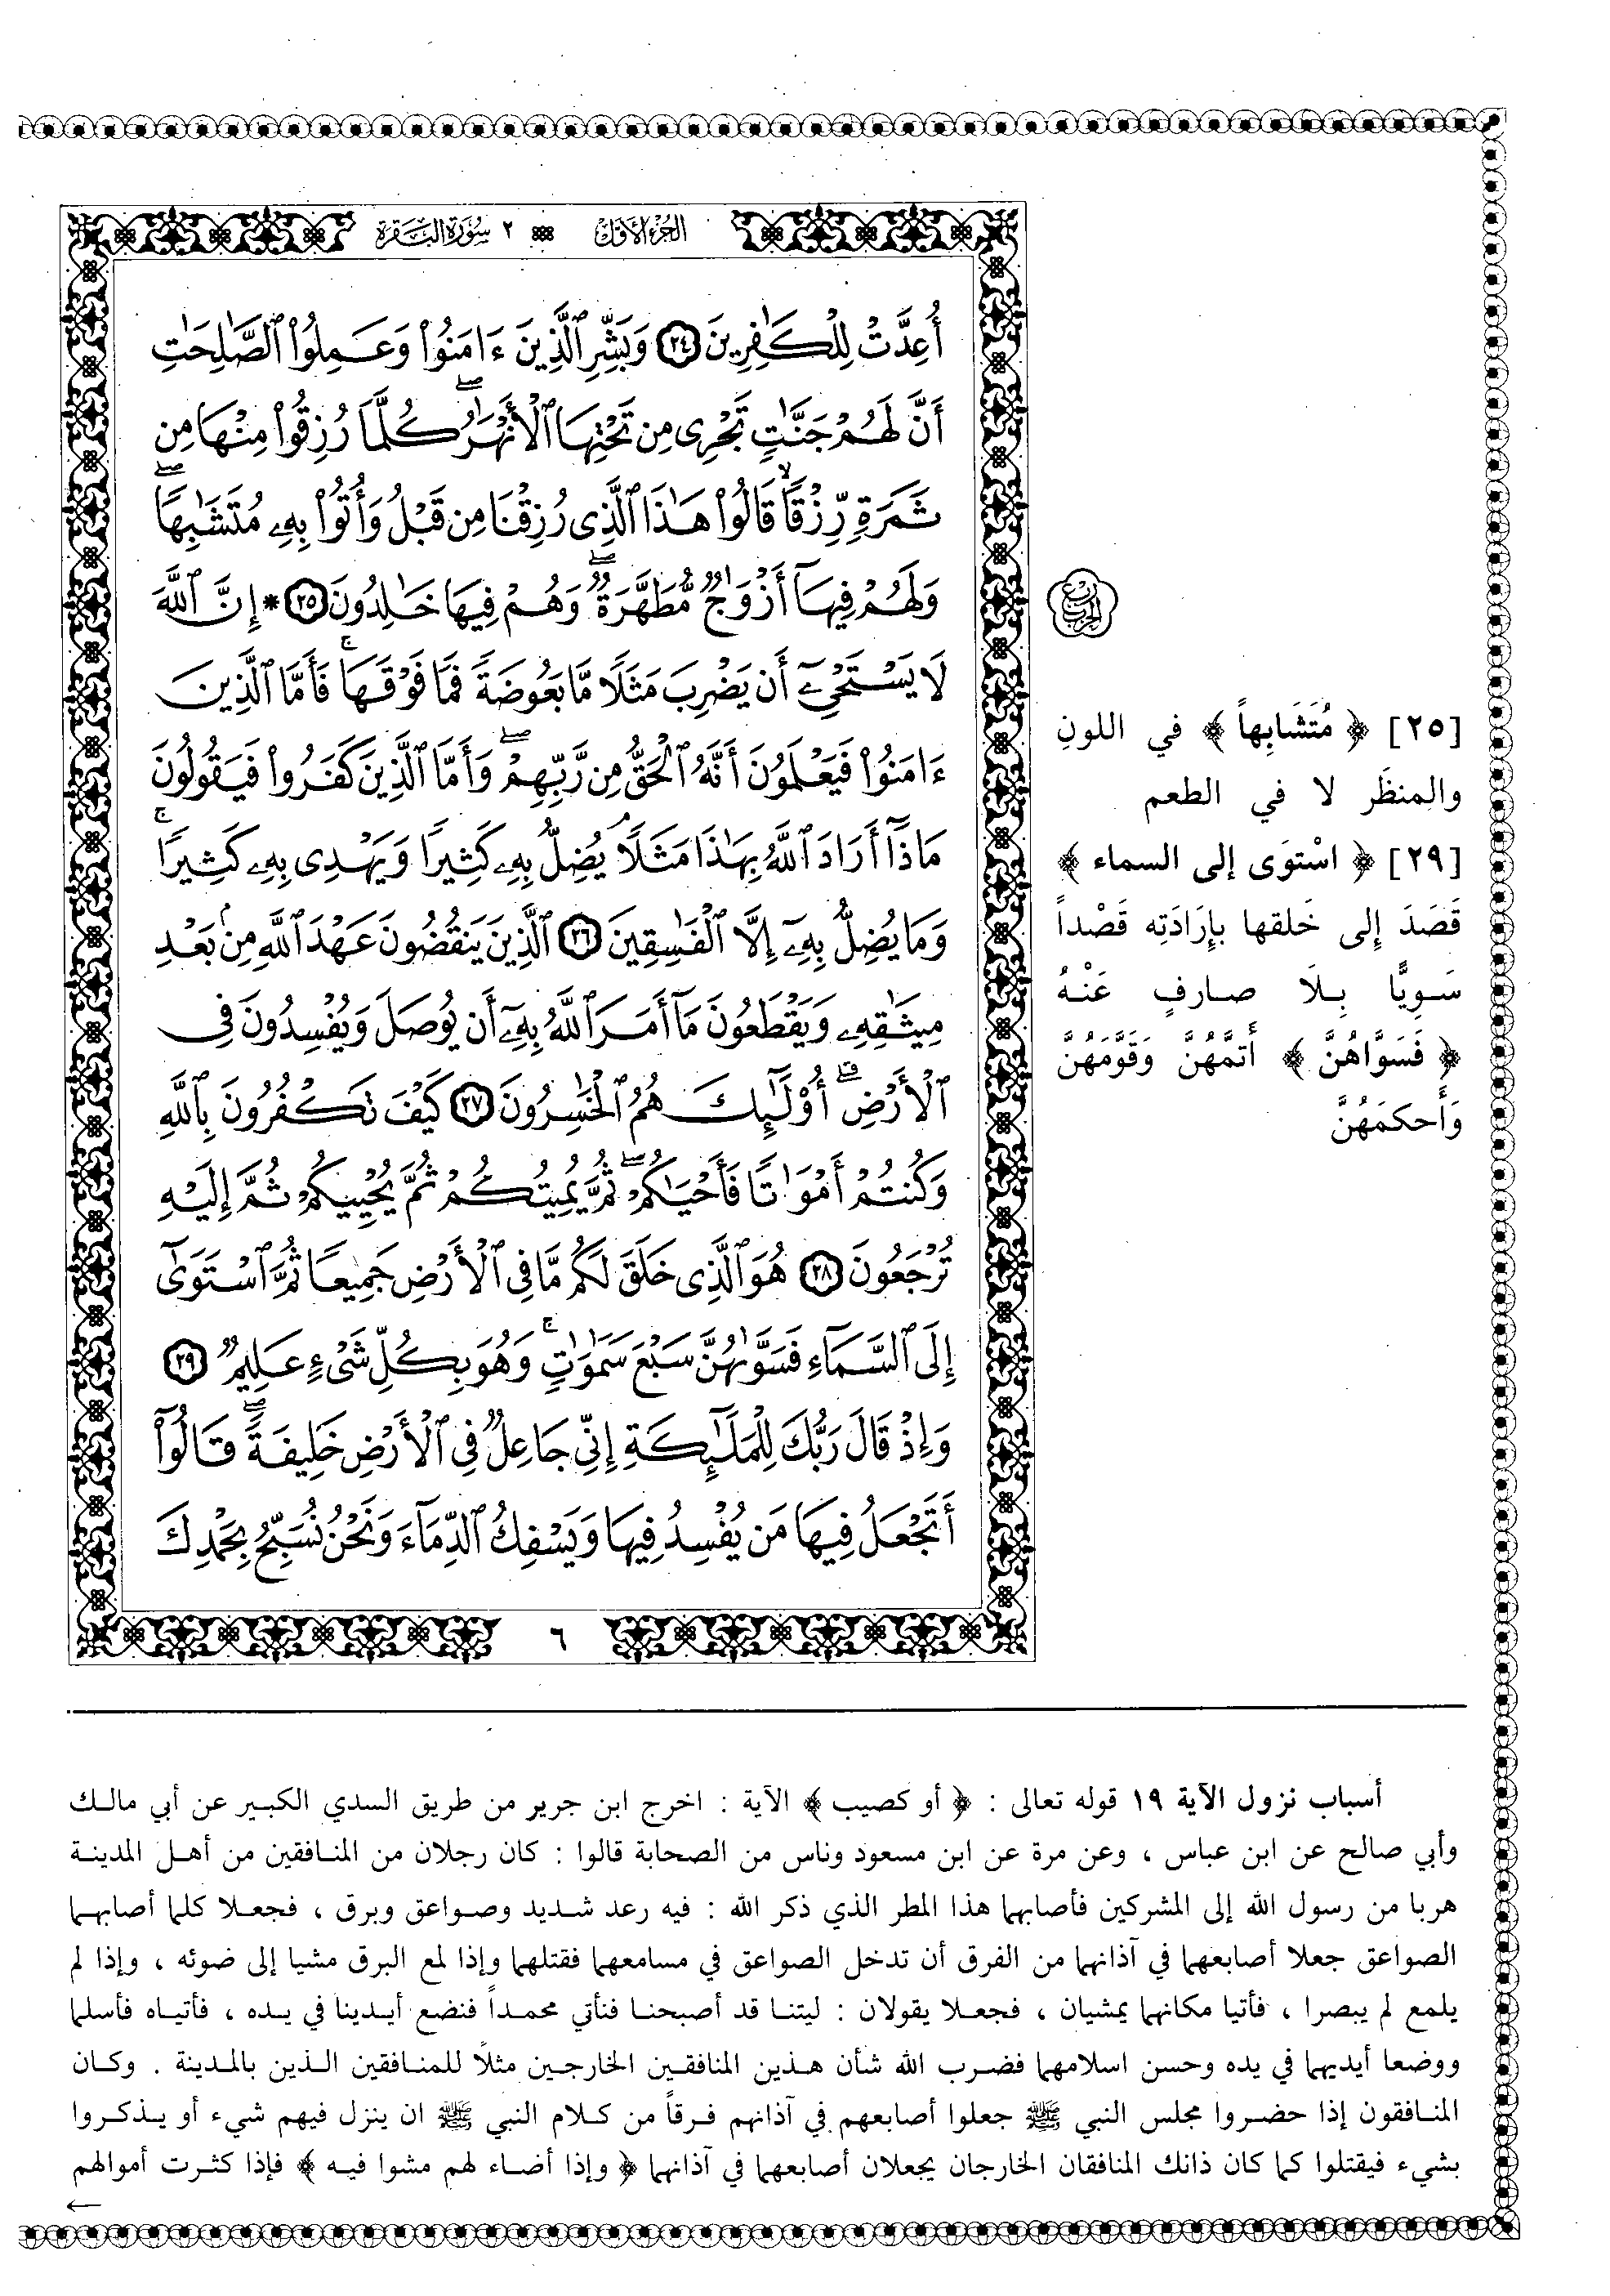 Pin By القران الكريم The Holy Quran On القرآن الكريم بالرسم العثماني وبهامشه كلمات القرآن تفسيروبيان Words Word Search Puzzle Sheet Music